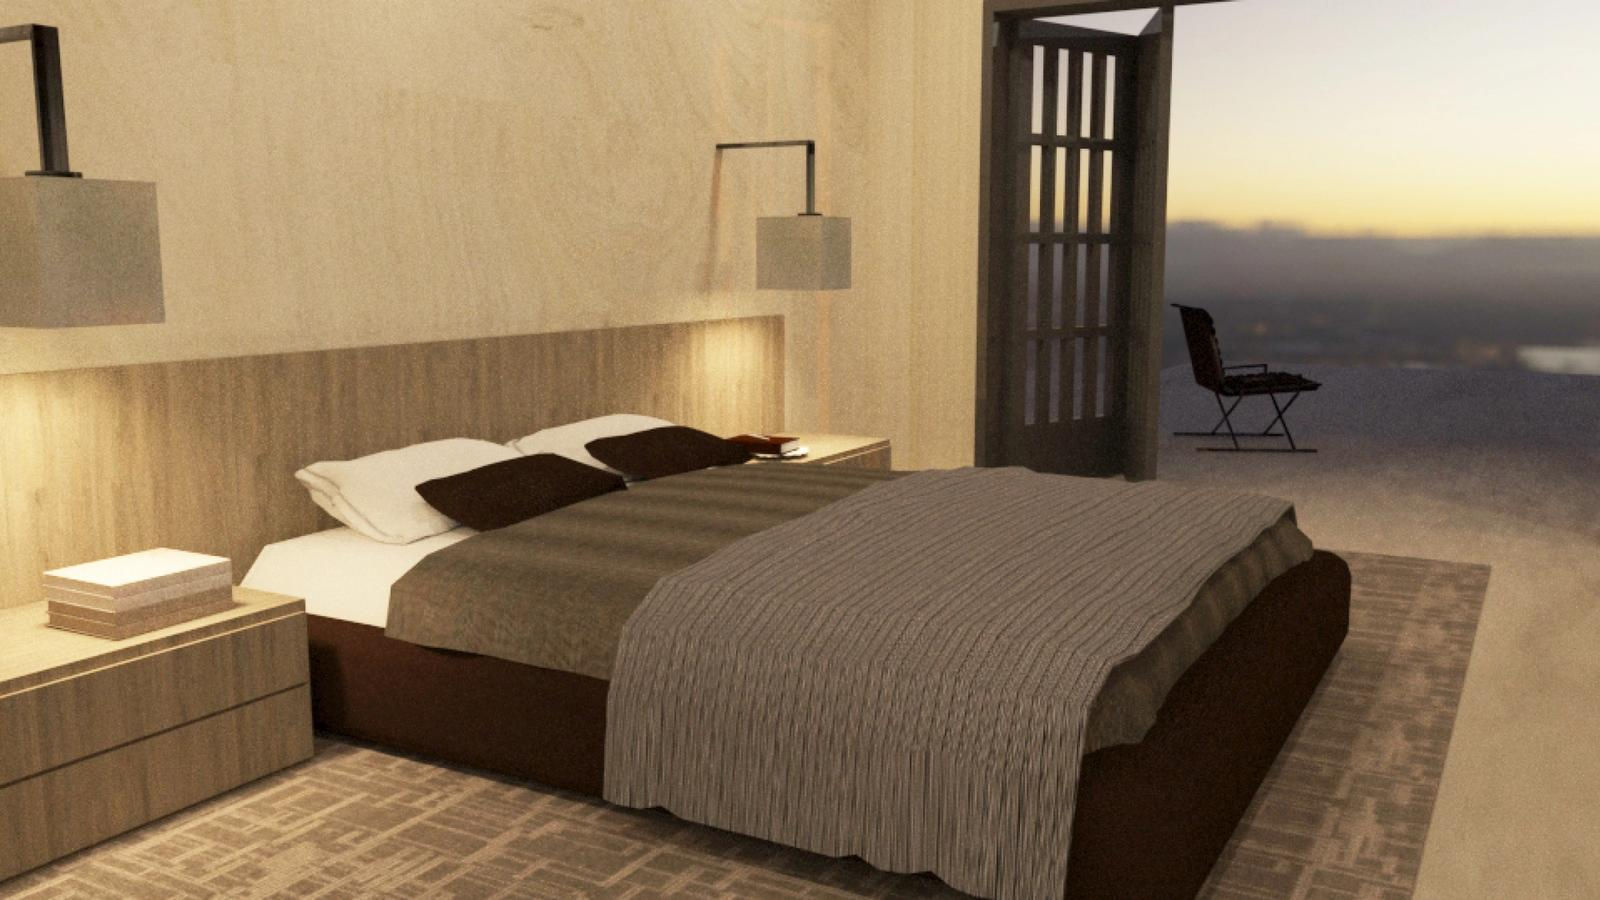 Artist Studio Loft - Bedroom Evening with Task Light